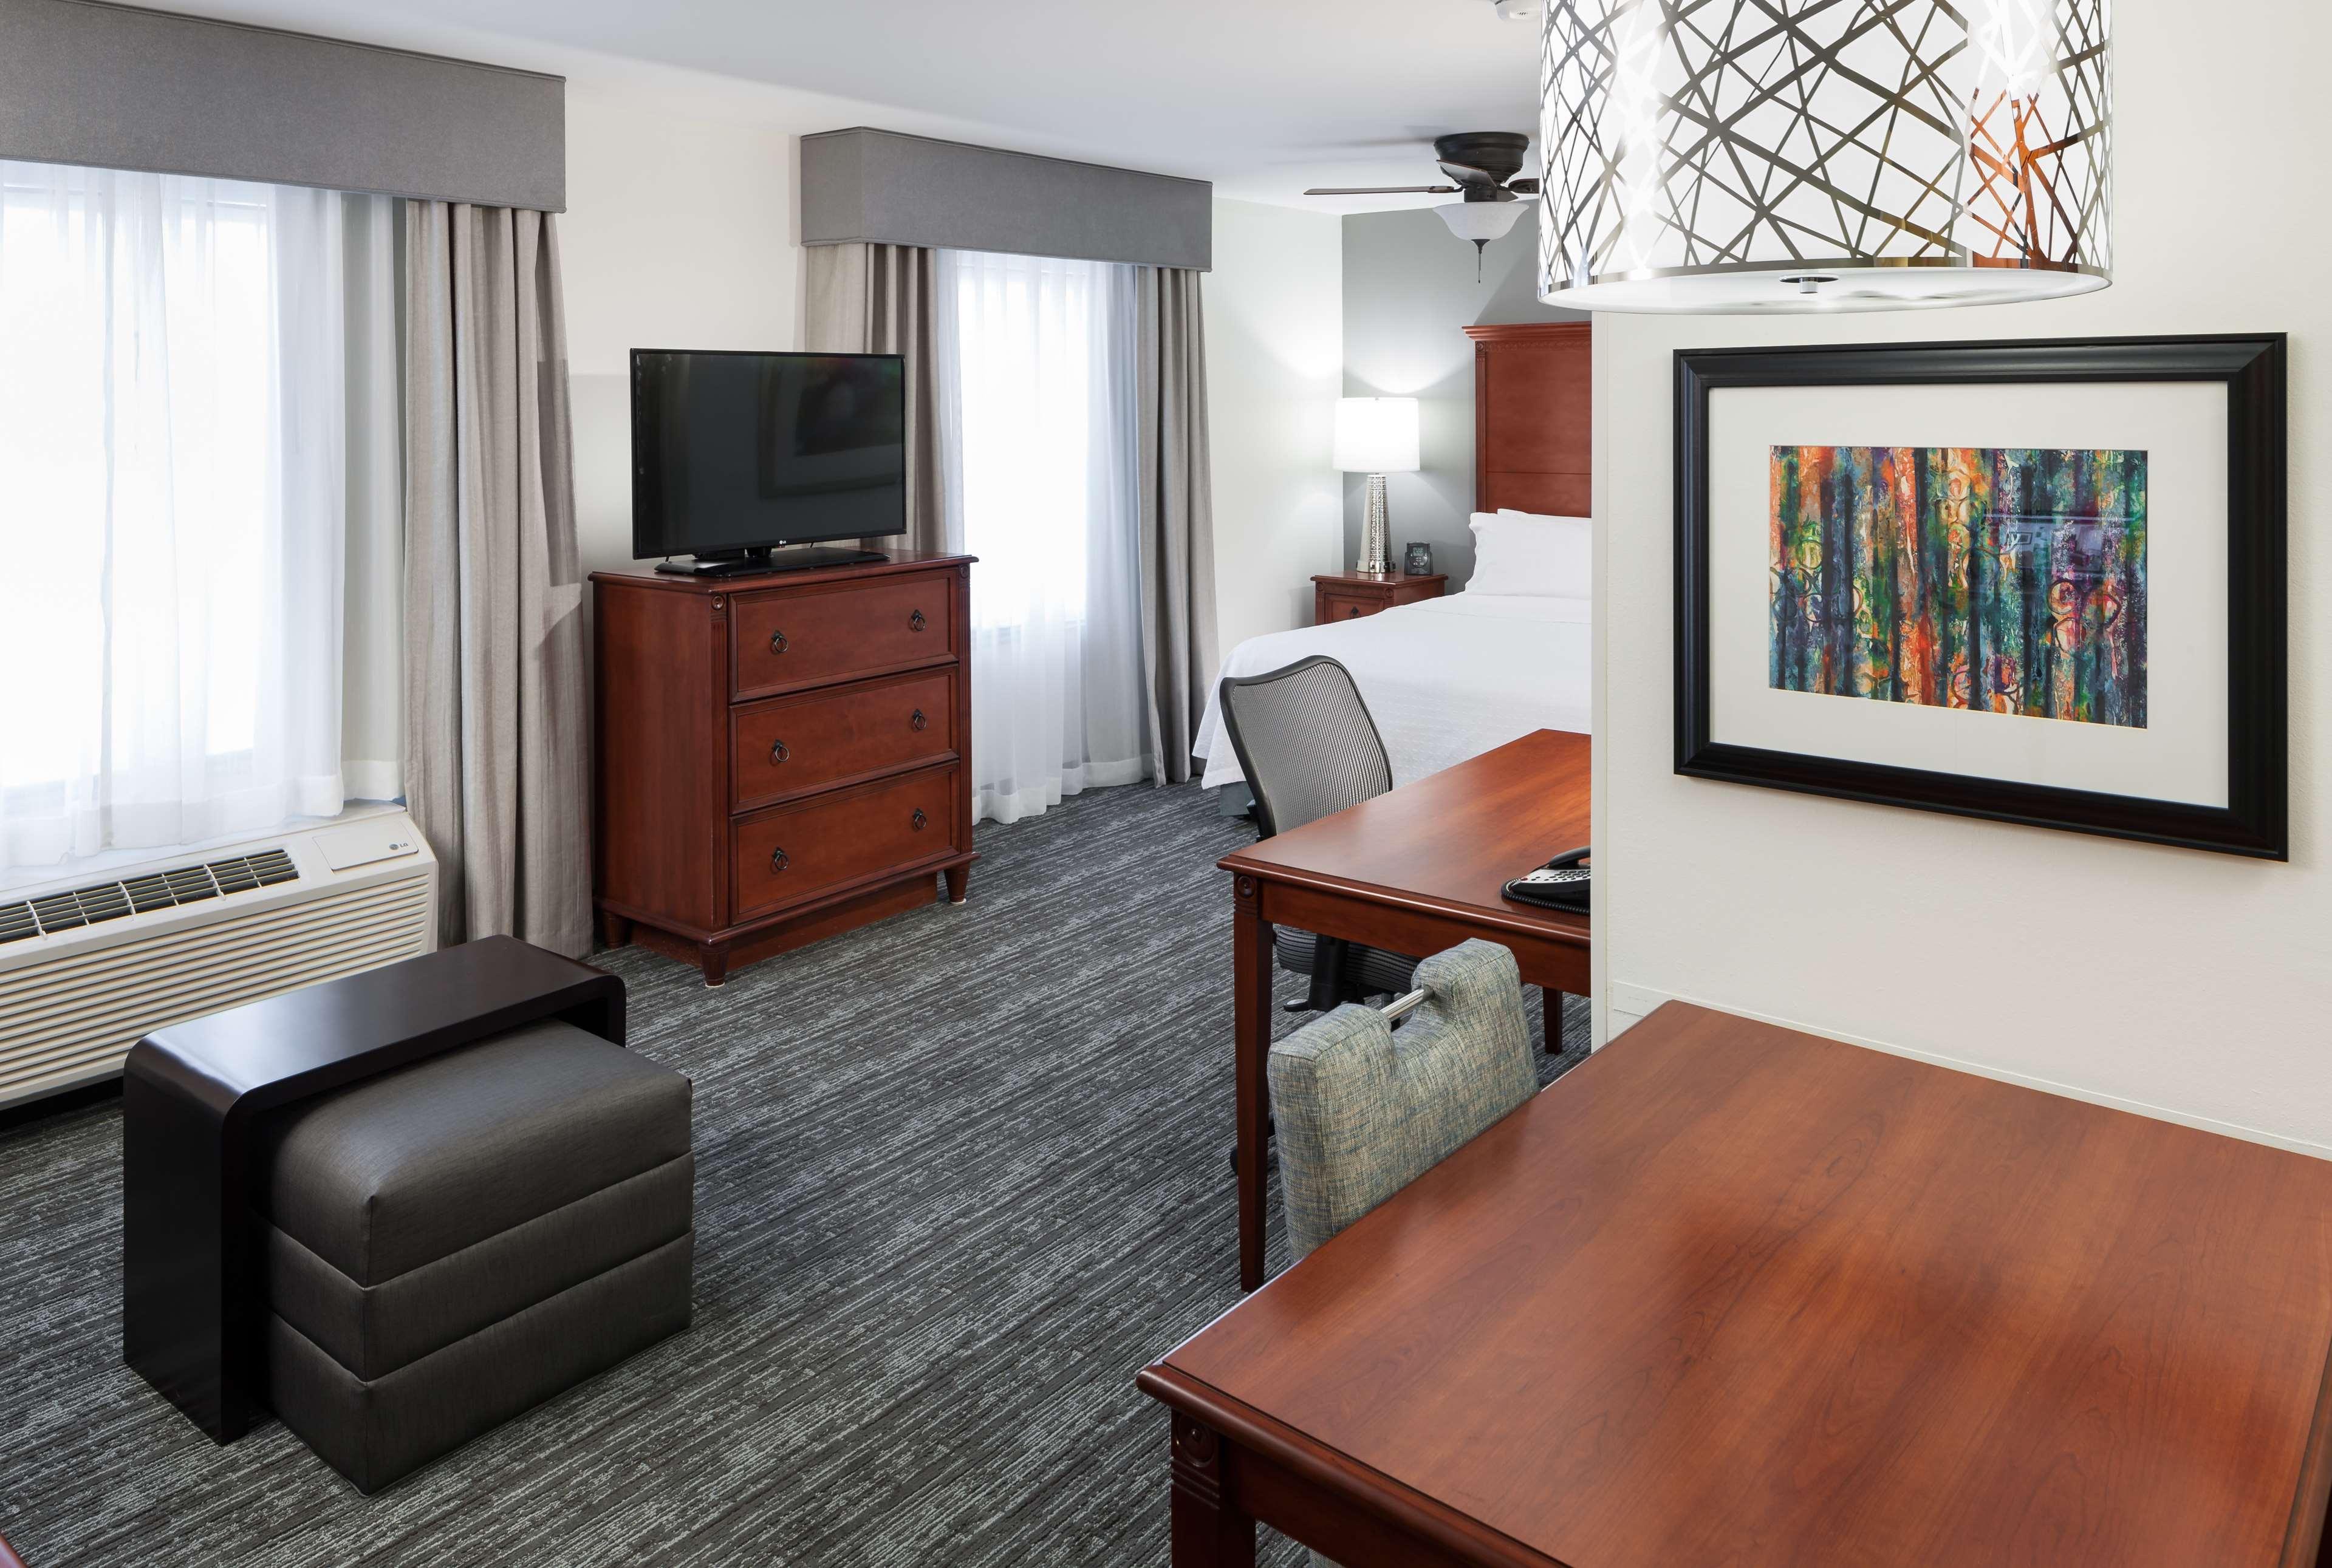 Homewood Suites by Hilton Denton image 19